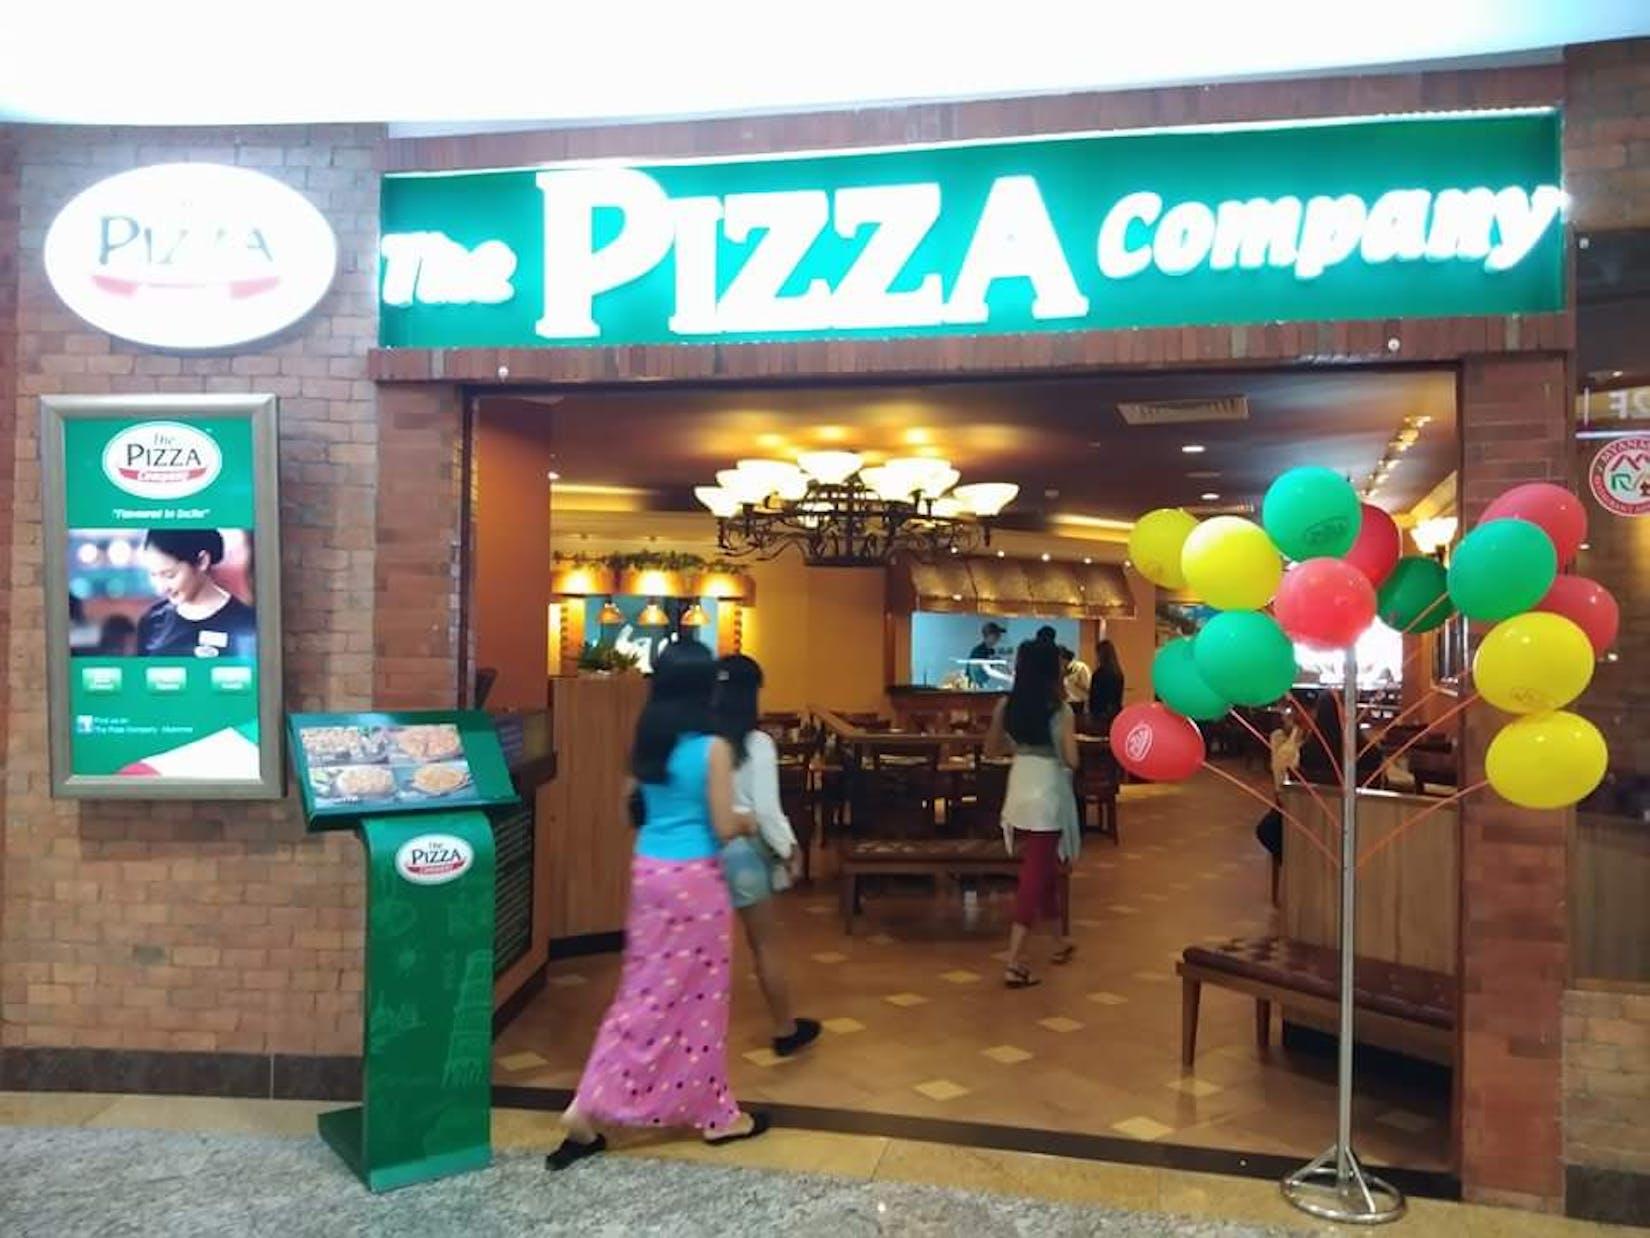 The Pizza Company | yathar